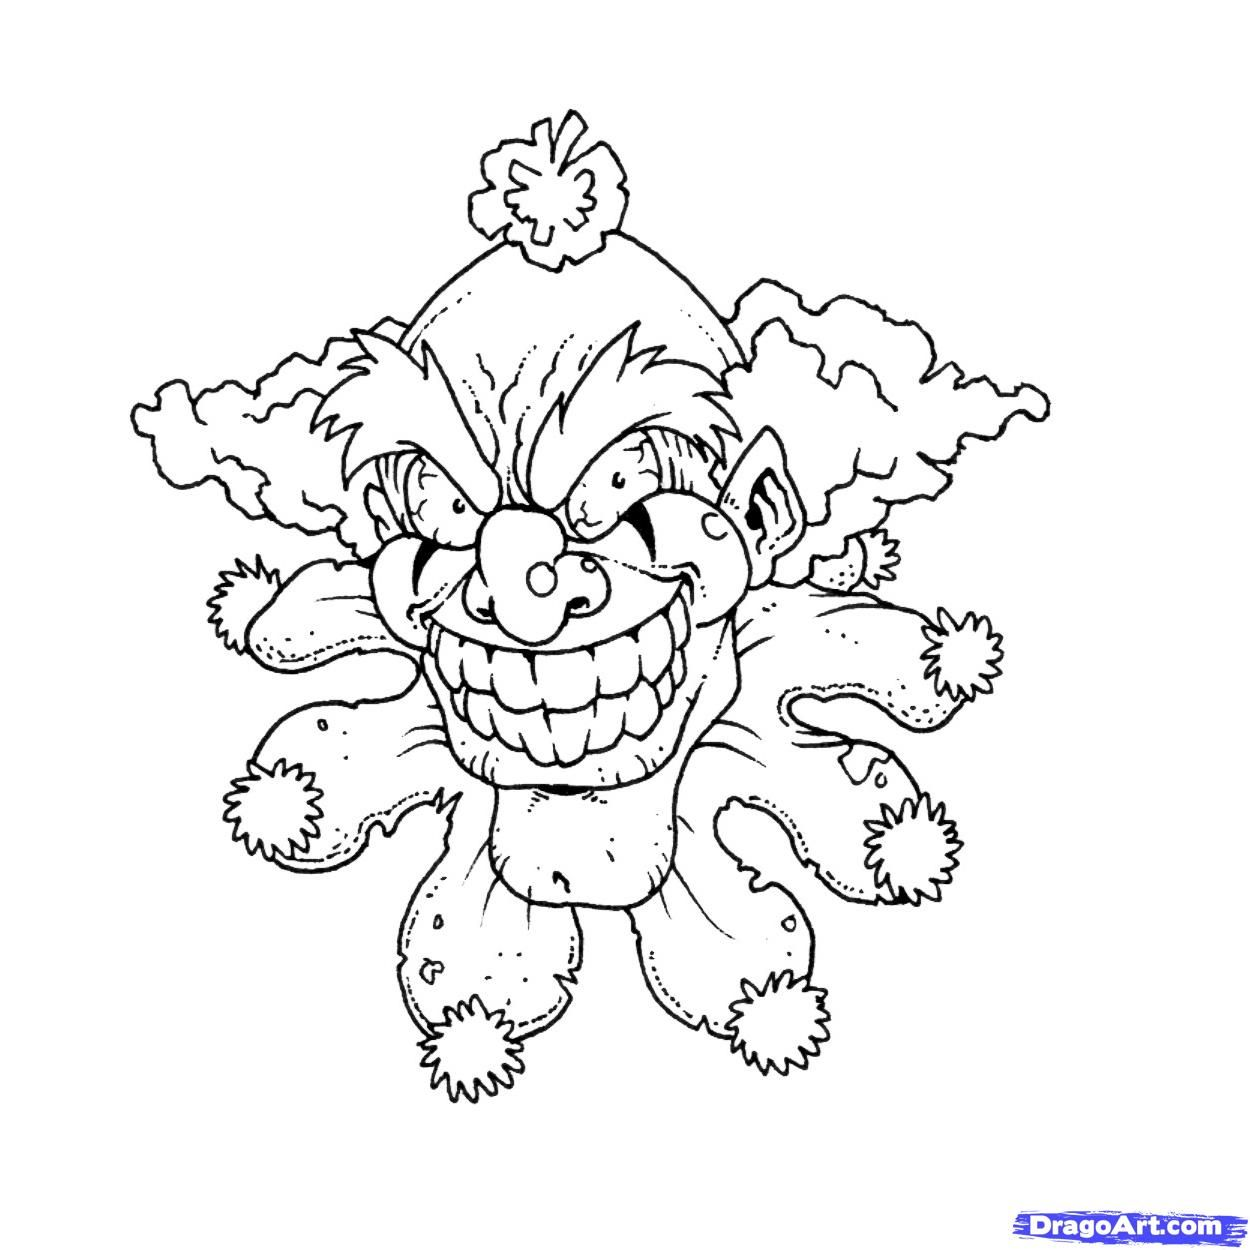 evil clown drawings Google Search Cartoon coloring